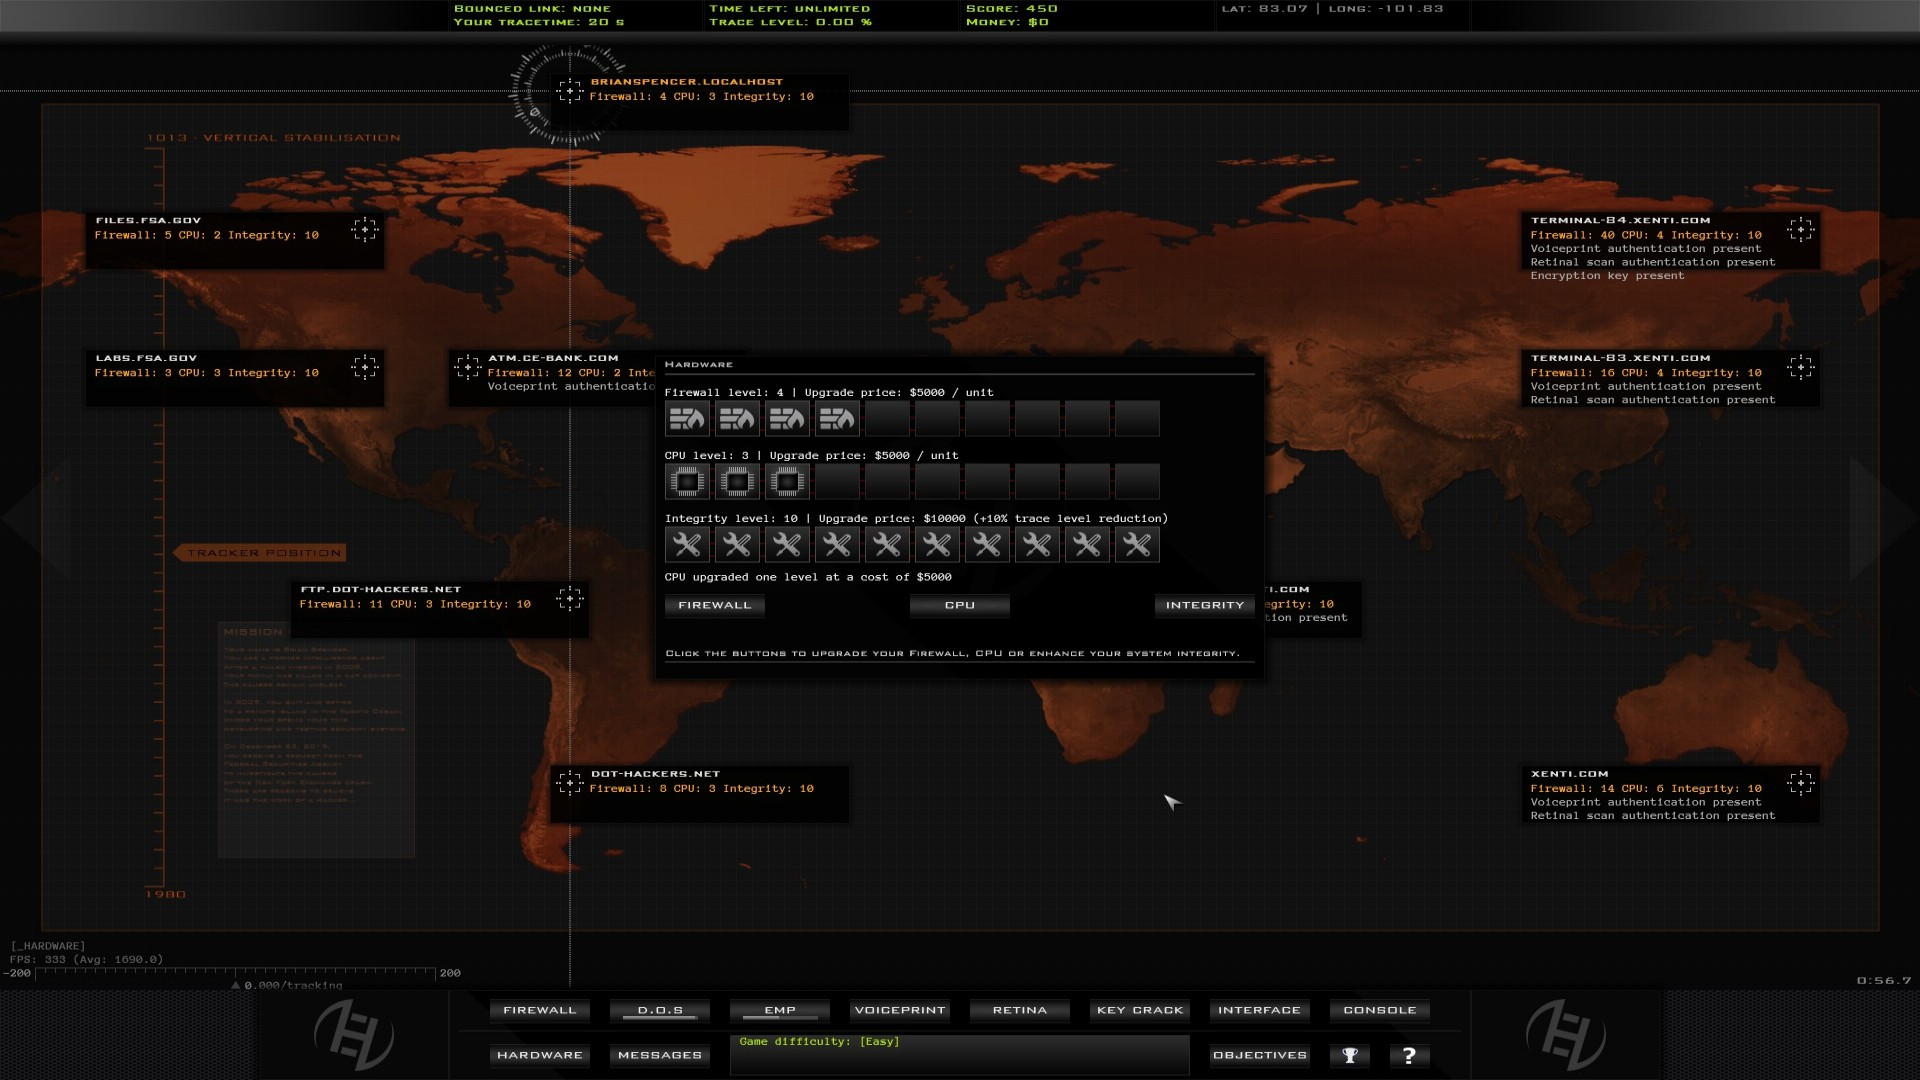 Hacker Evolution Duality: Inception Part 1 DLC screenshot